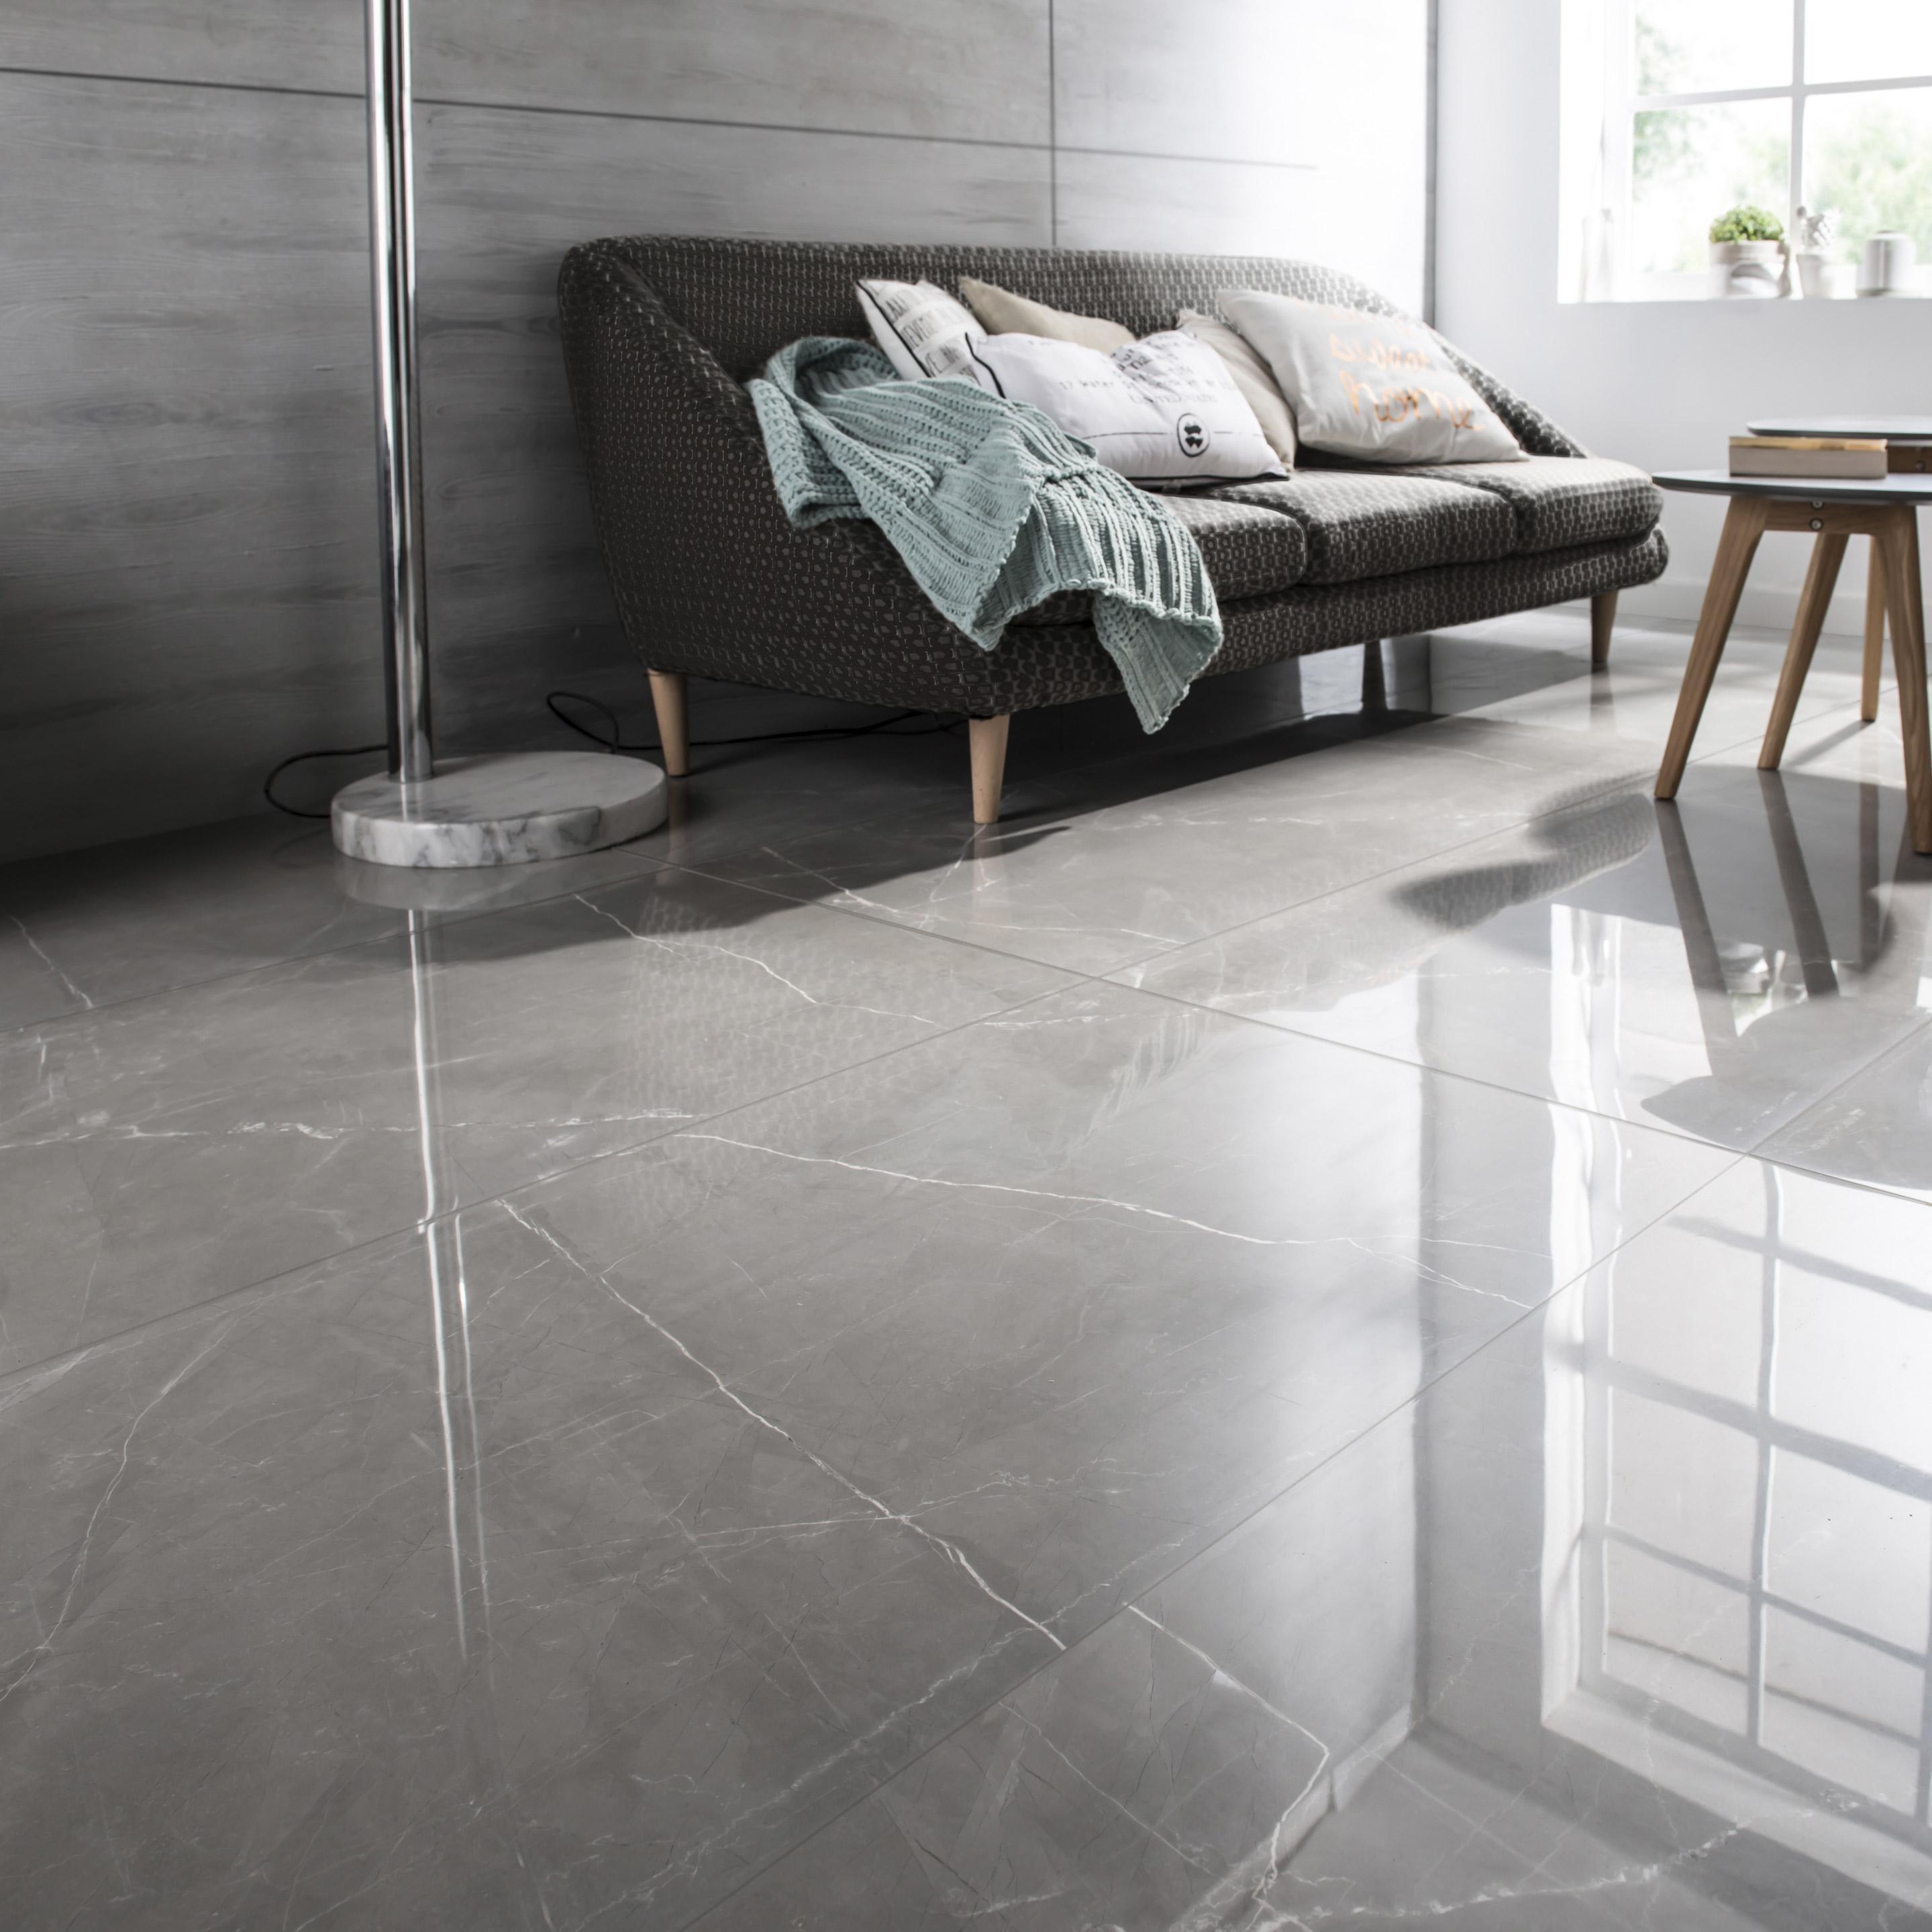 Carrelage sol et mur intenso marbre gris Rimini l.60xL.120cm CERIM INSPIRED+39